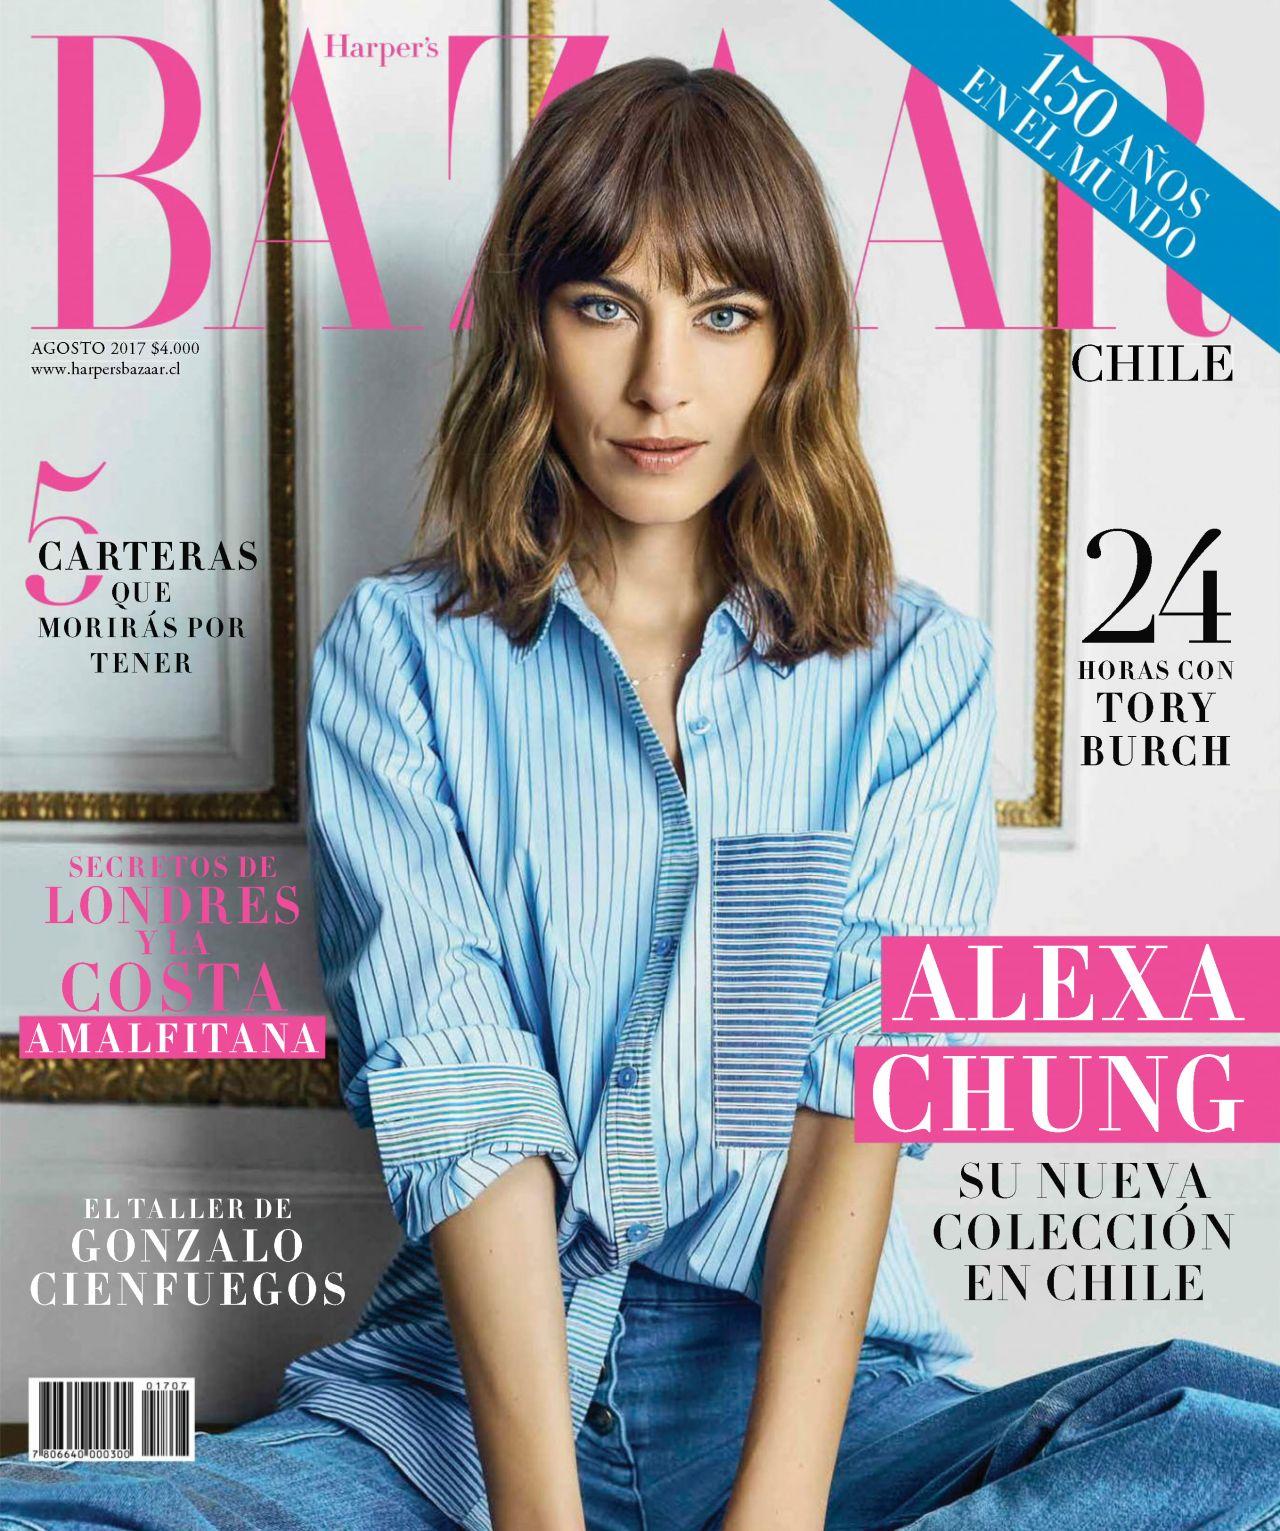 alexa-chung-harper-s-bazaar-magazine-chile-august-2017-issue-6 (1).jpg